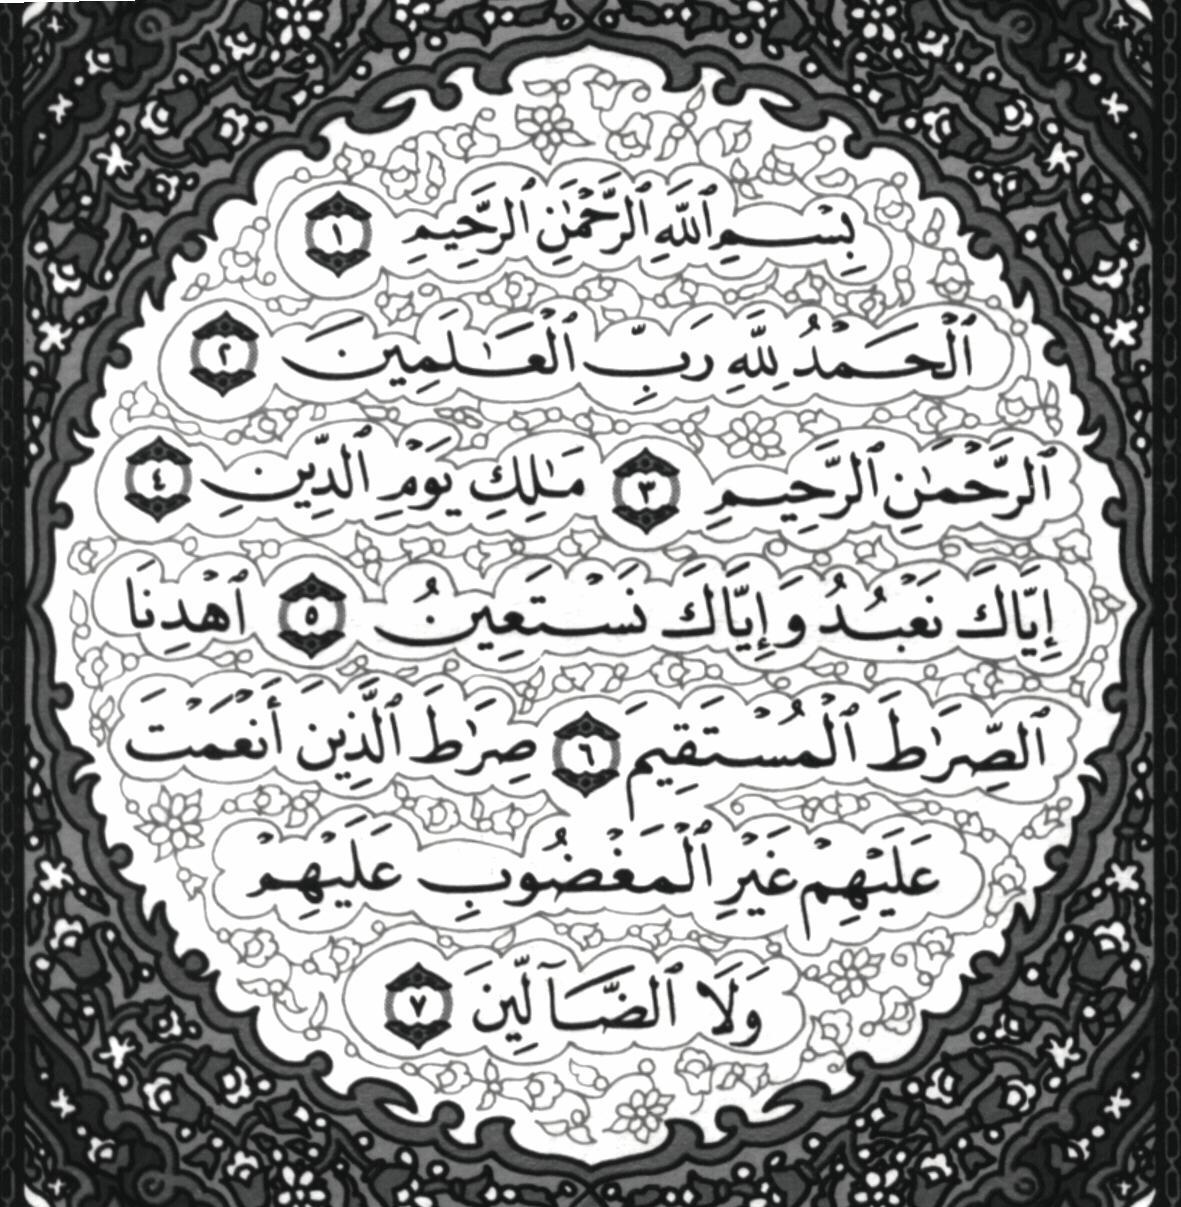 http://1.bp.blogspot.com/_CrAS6Uvtf18/TJWSbdyAsJI/AAAAAAAAAgo/zpZeHdyfySI/s1600/al-fatihah-2.jpg